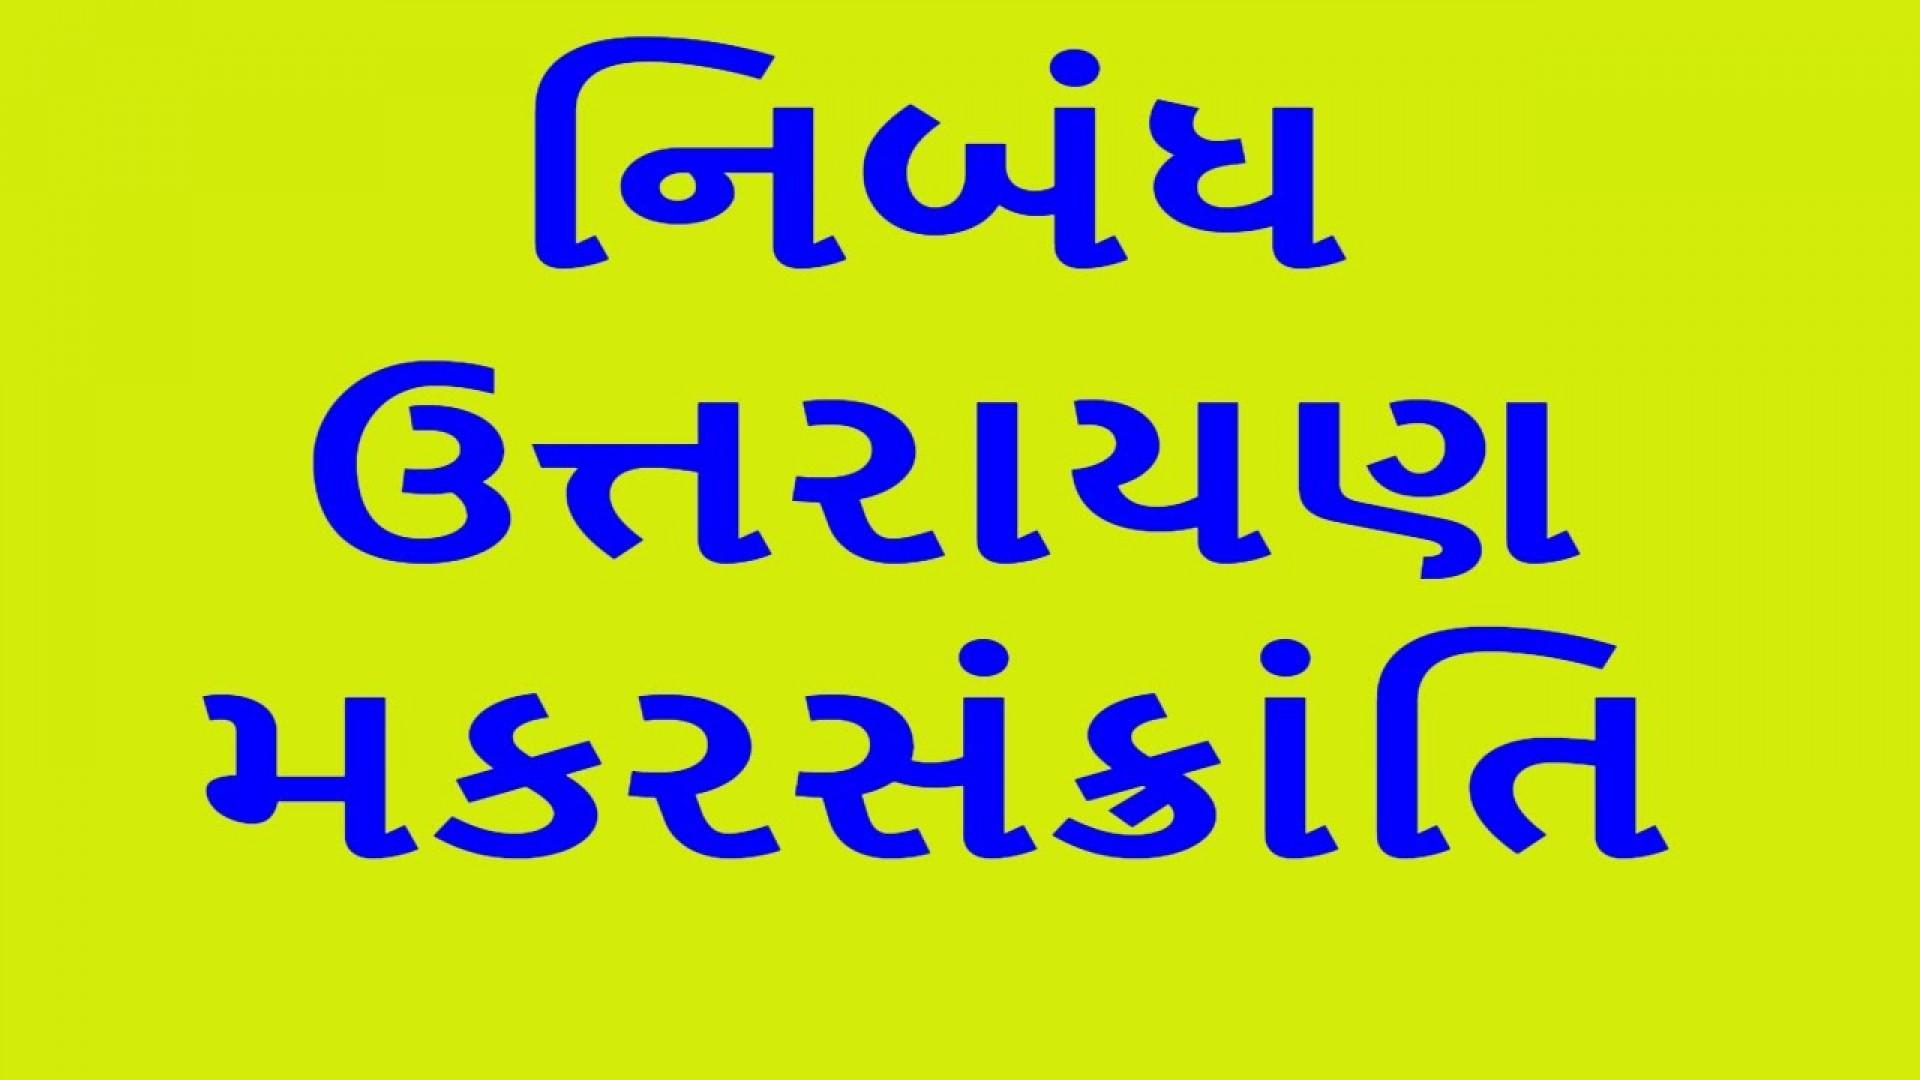 004 Makar Sankranti In Hindi Essay Maxresdefault Surprising Pdf Download 2018 1920